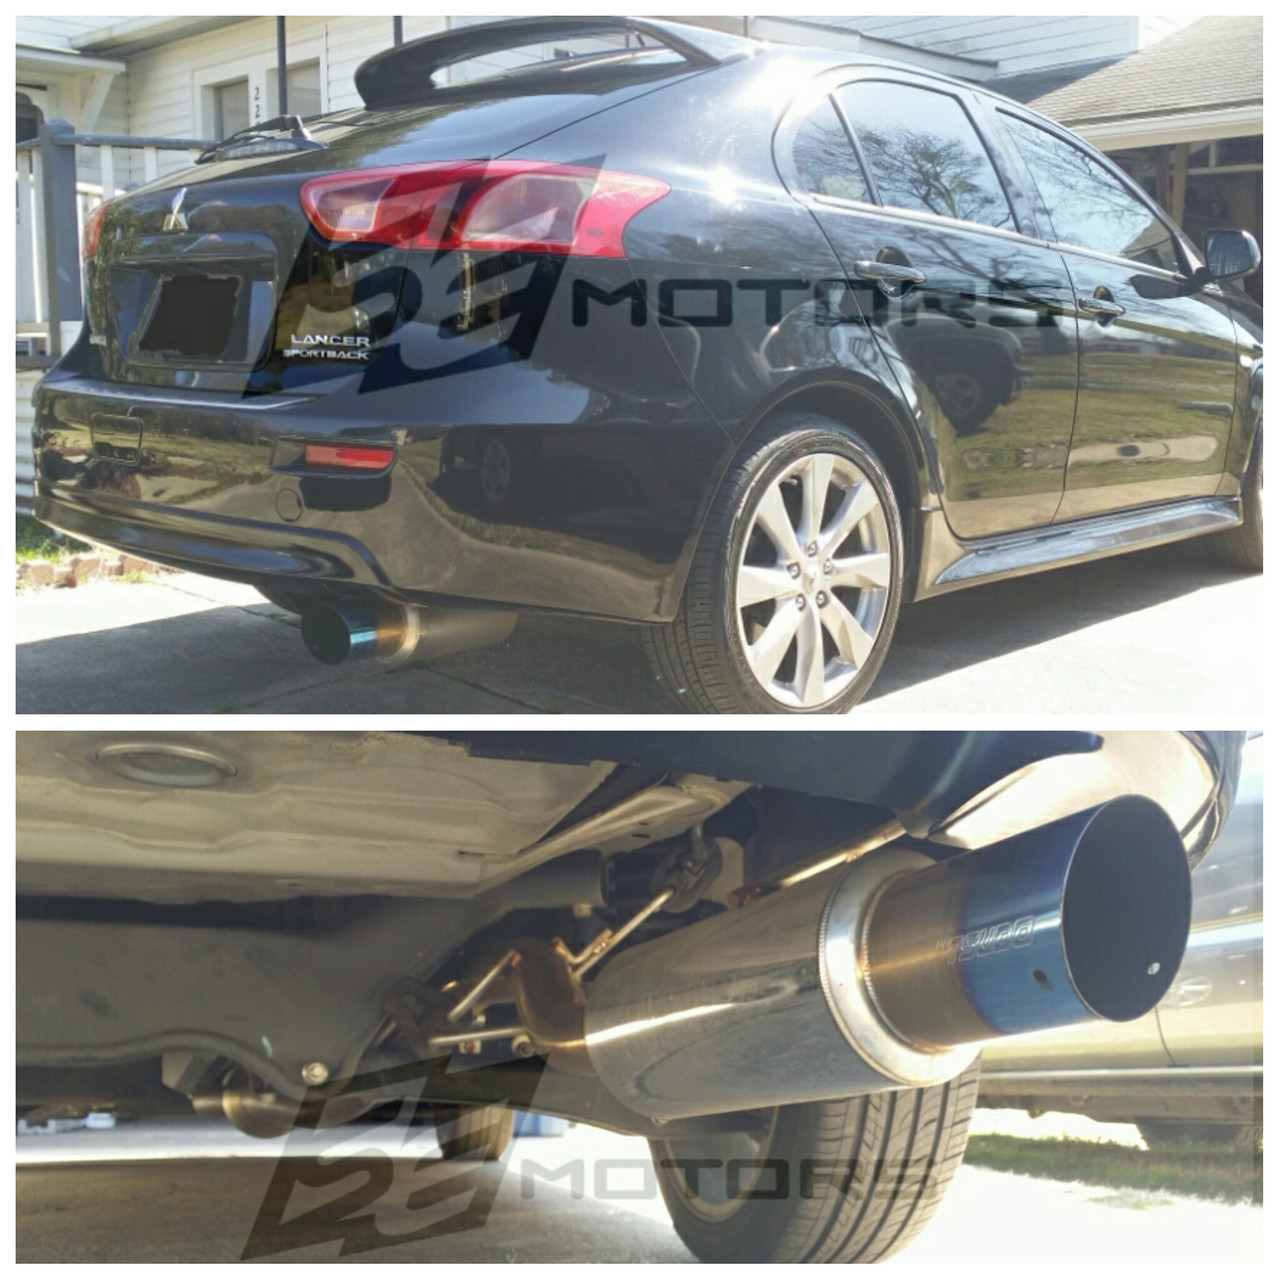 Tsudo 12-15 Mitsubishi Lancer SportsBack DE ES GT S2 Burnt Tip Axleback Exhaust (22-9201)